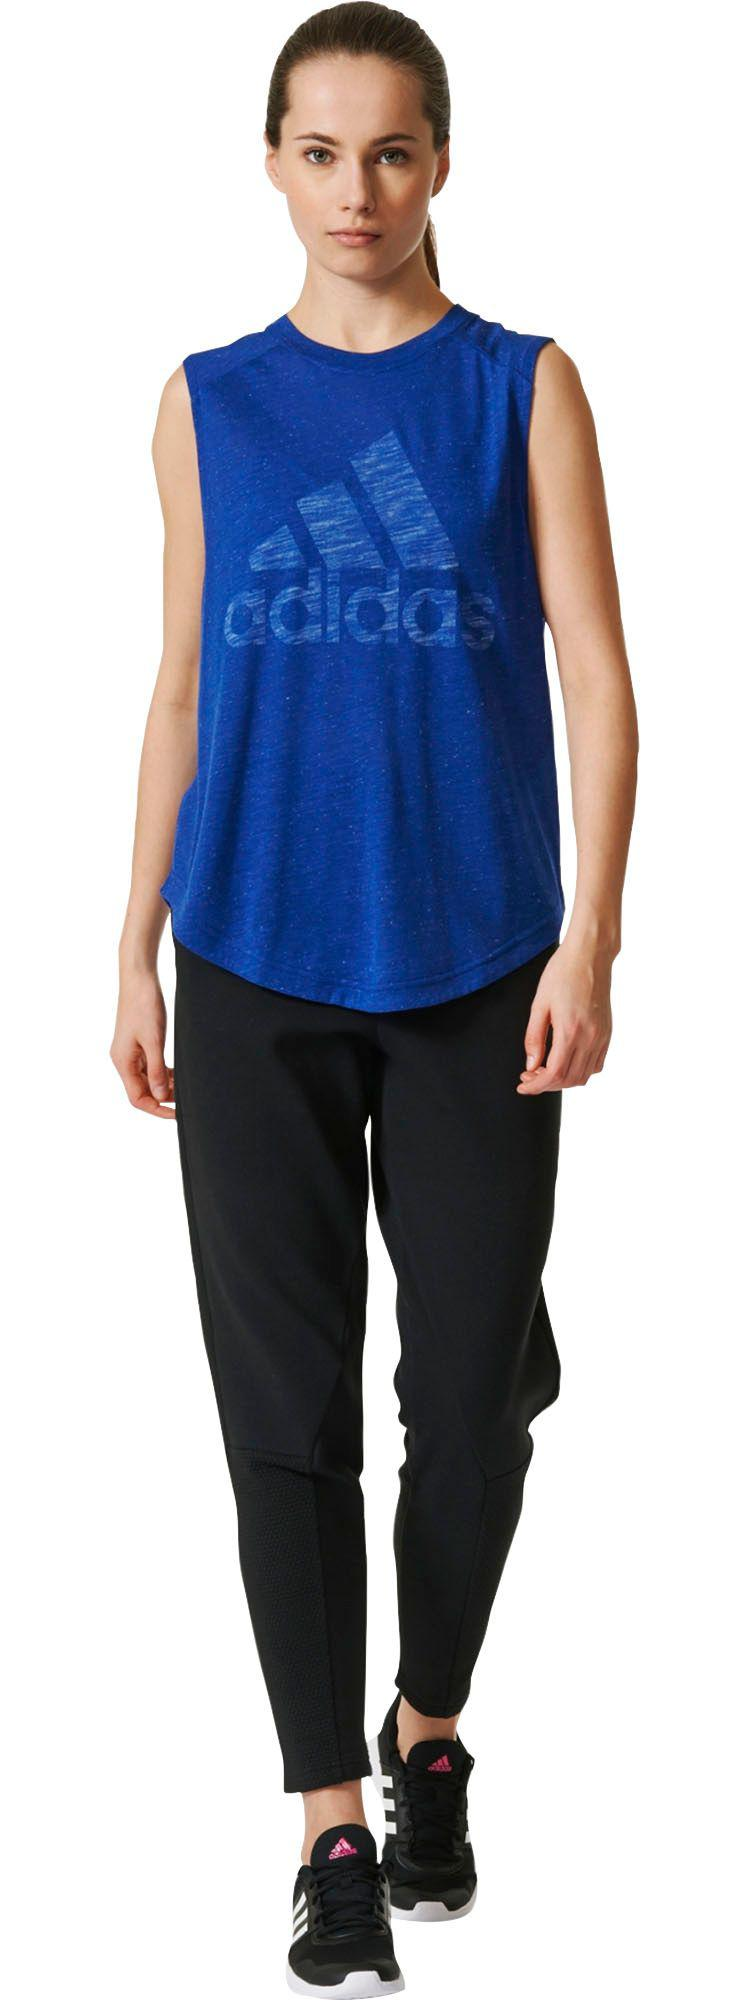 dac310d3db50a Lyst - adidas Winners Muscle Tank Top in Blue